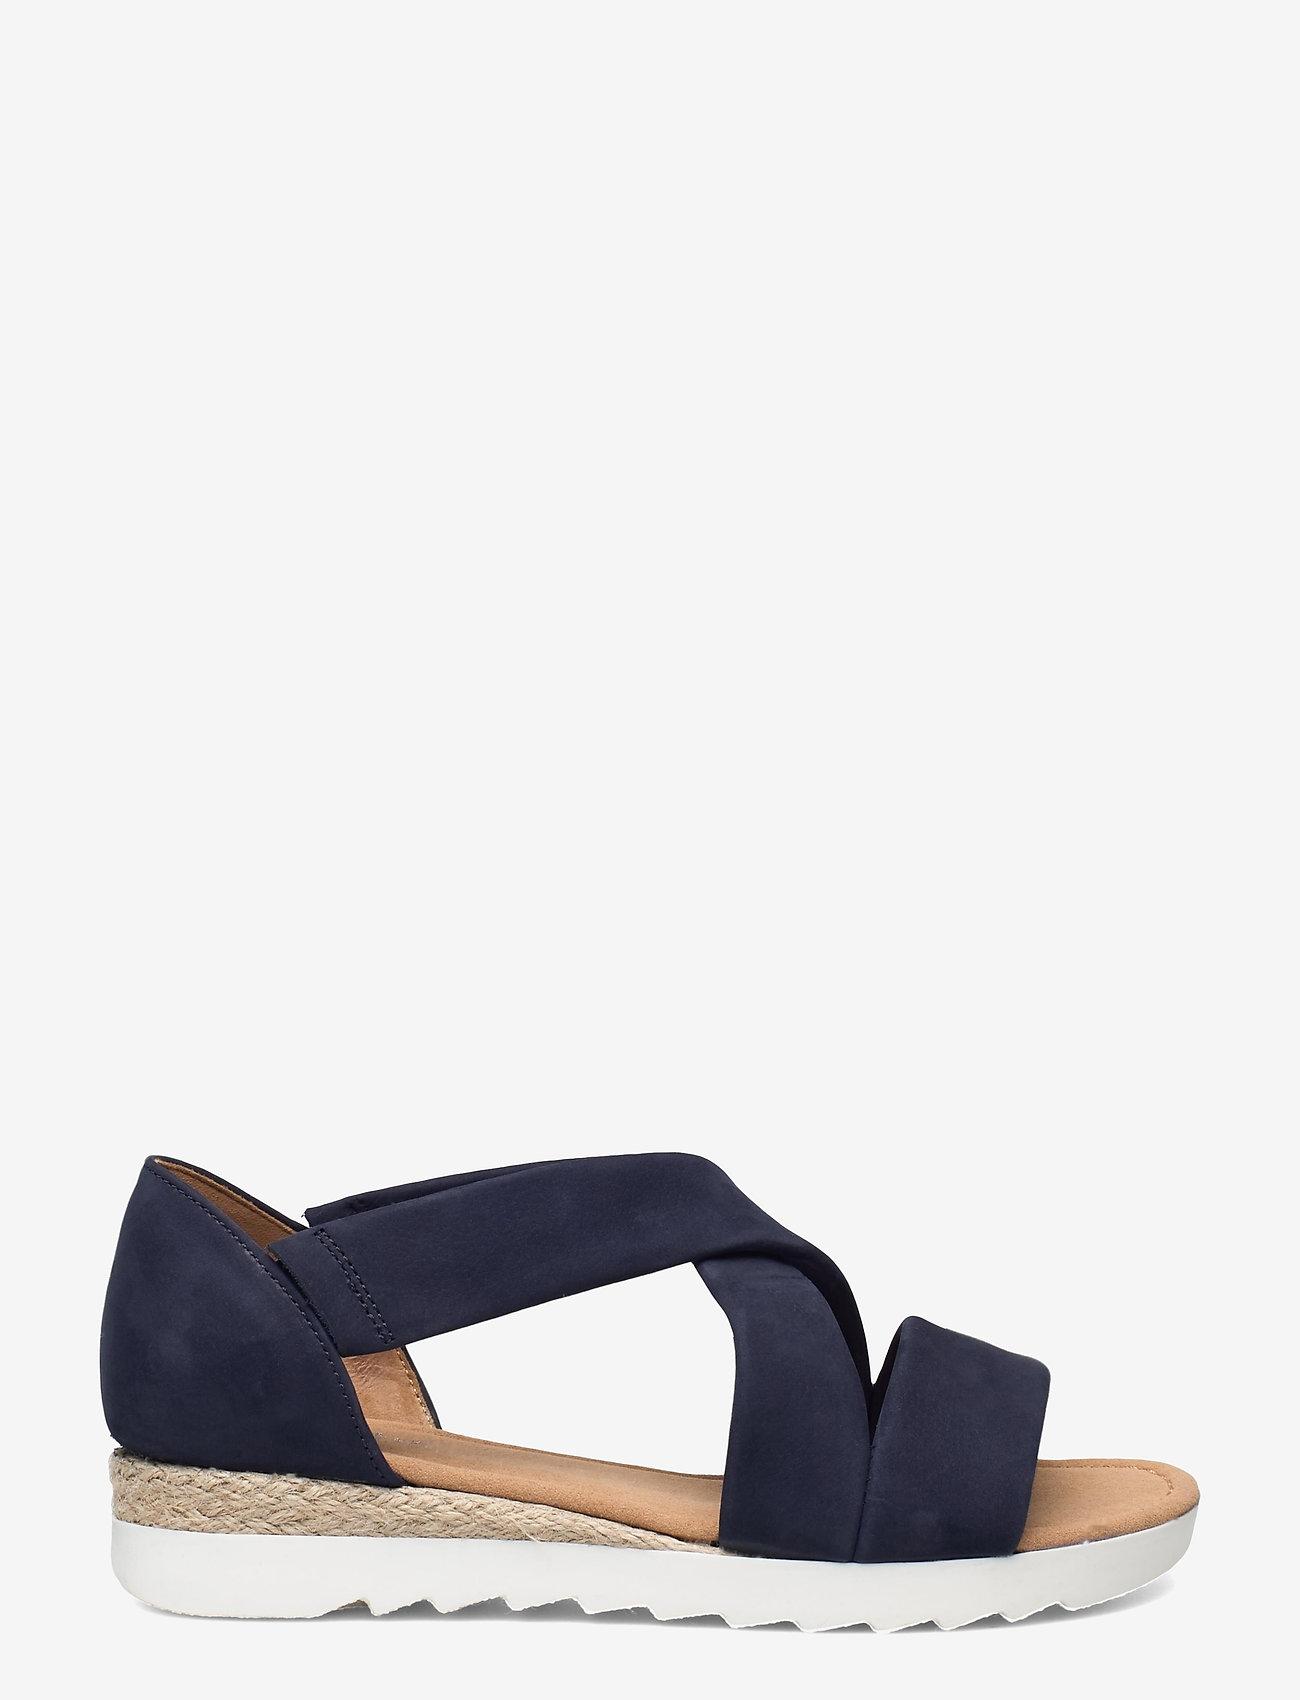 Gabor - Ankle-stap sandal - espadrilles mit absatz - blue - 1